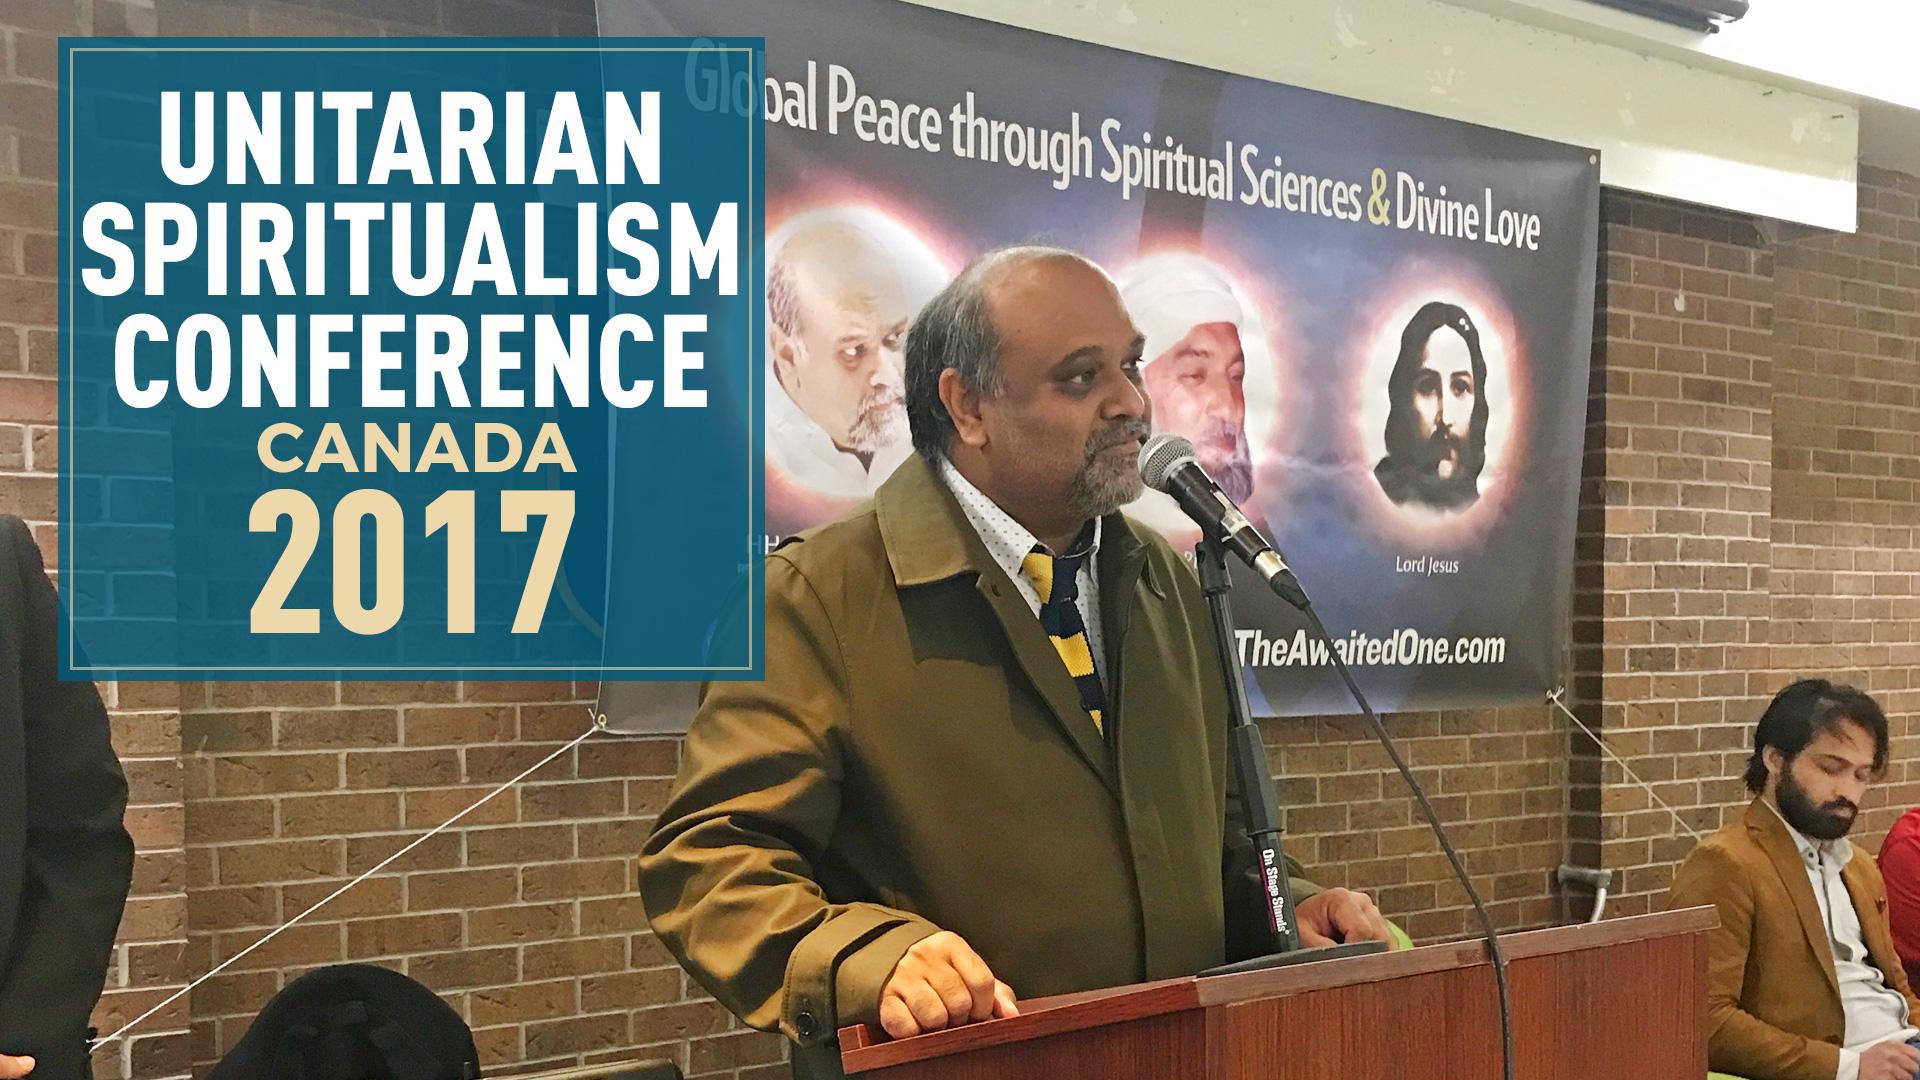 UnitarianSpiritualismConference